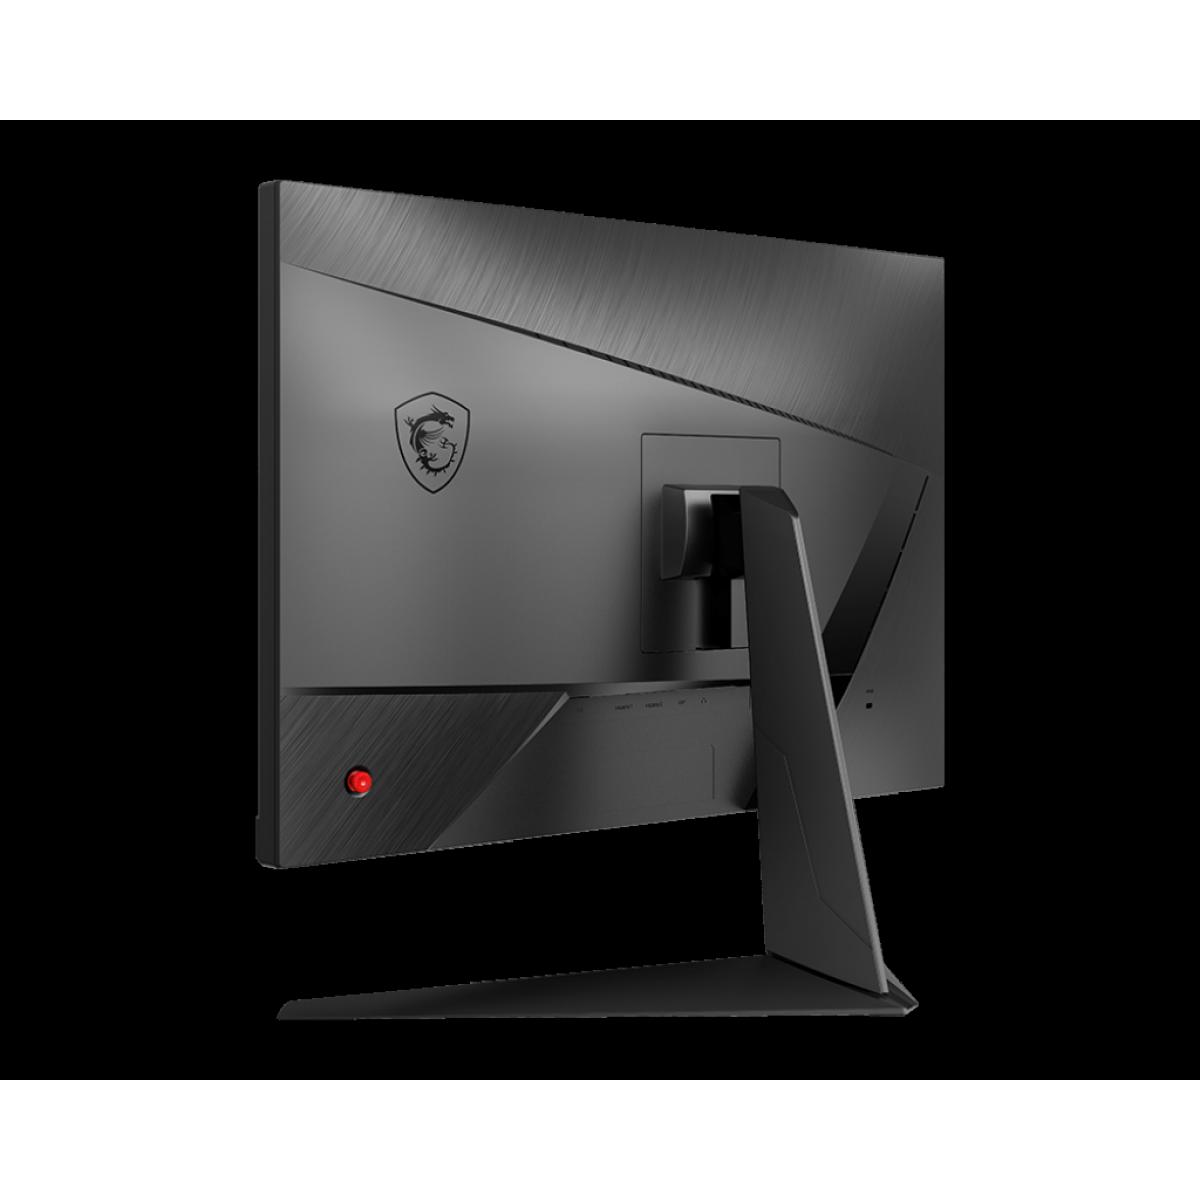 Monitor Gamer MSI Optix, 24 Pol, FullHD, 144Hz, 1ms, IPS, HDMI/DP, G242